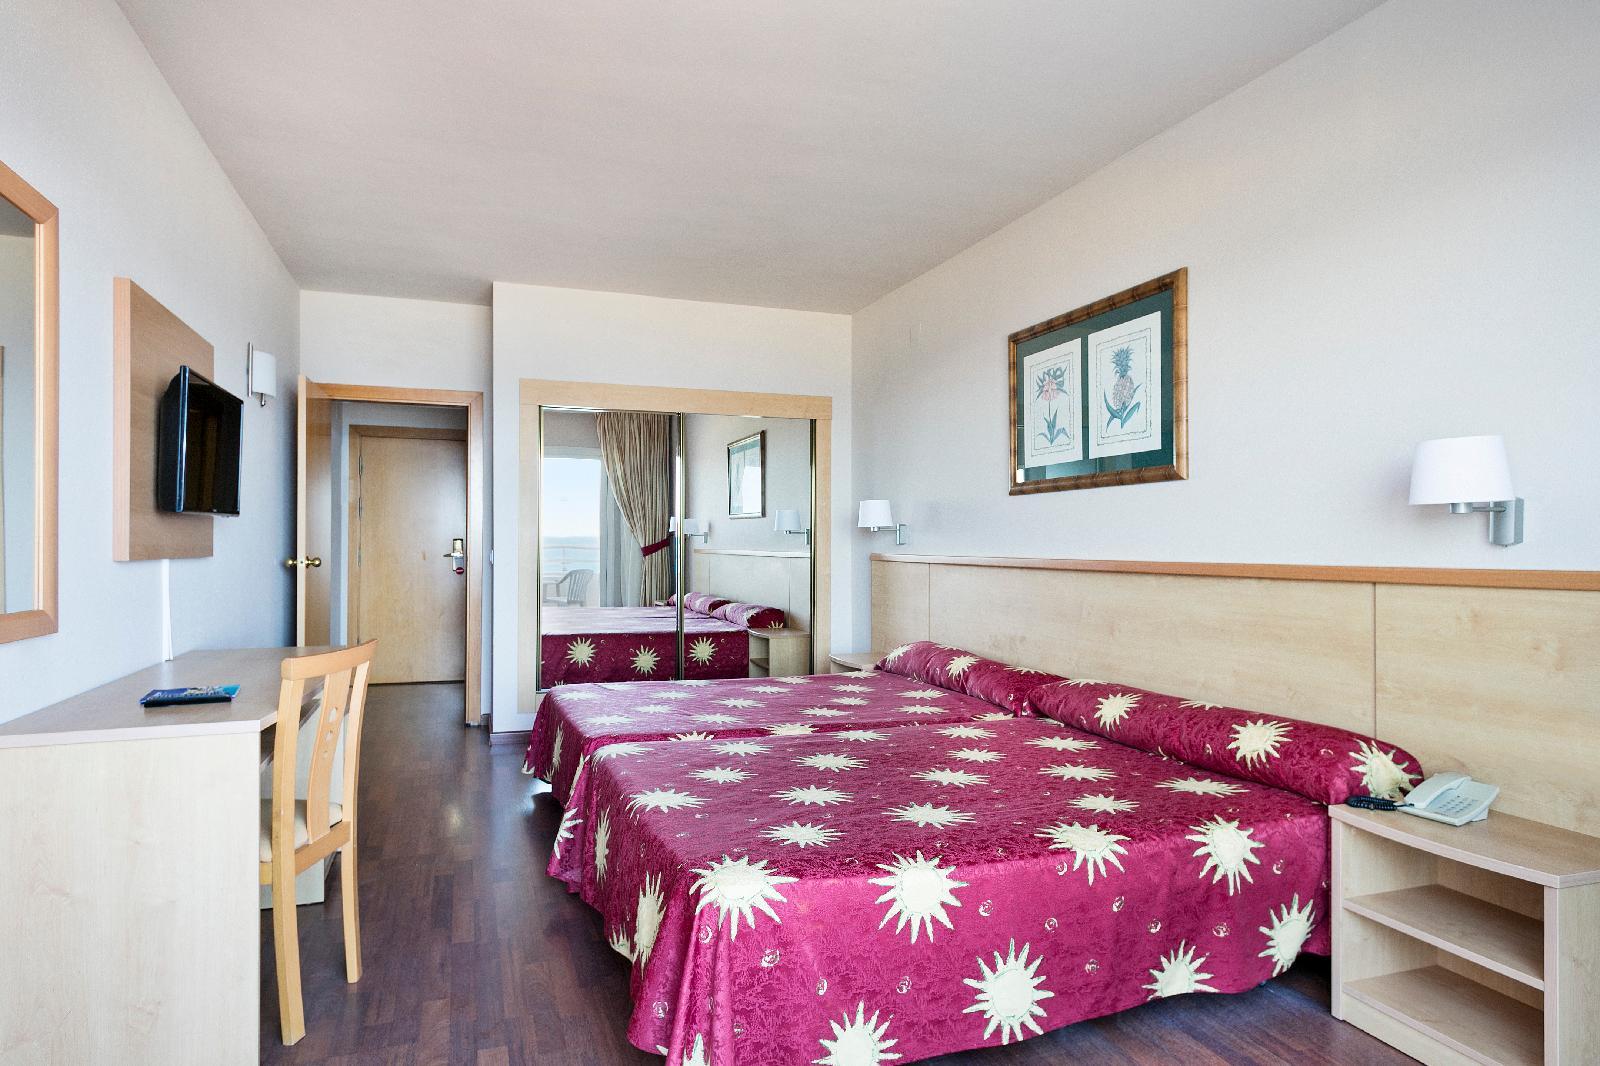 Hotel best oasis tropical en moj car costa de almer a - Oasis bano turco sl ...